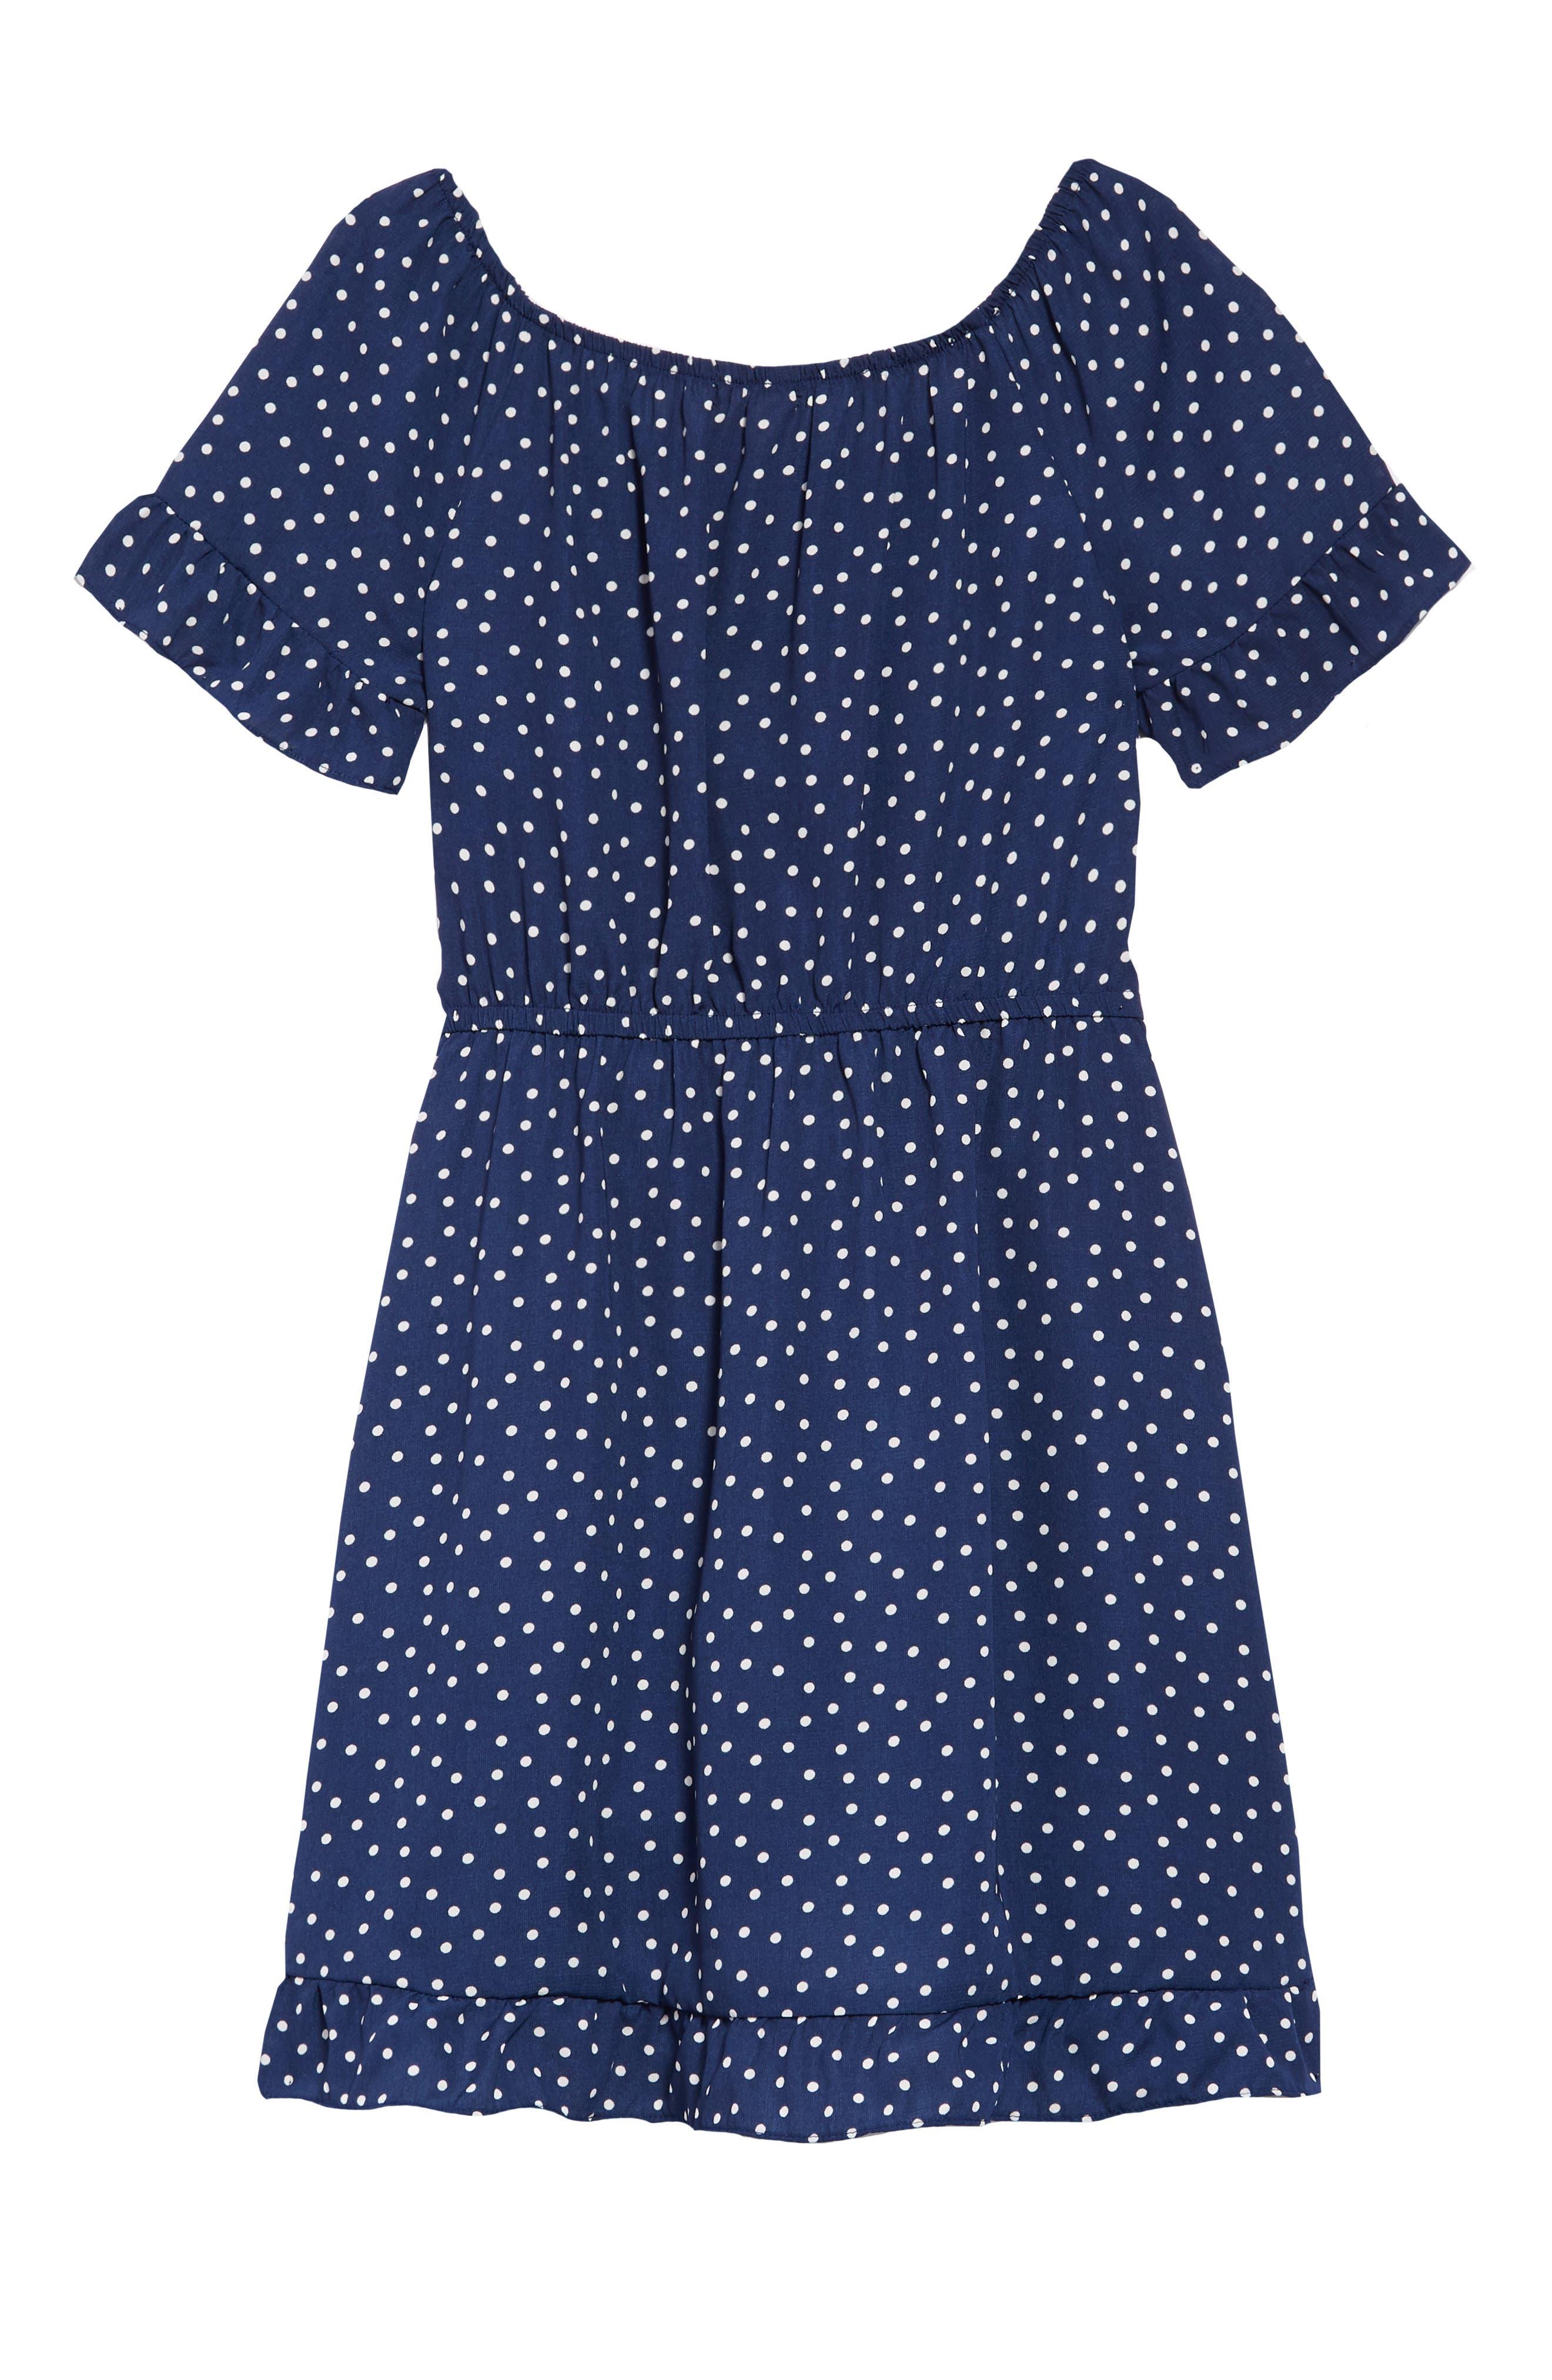 Ruffle Dress,                             Alternate thumbnail 2, color,                             401